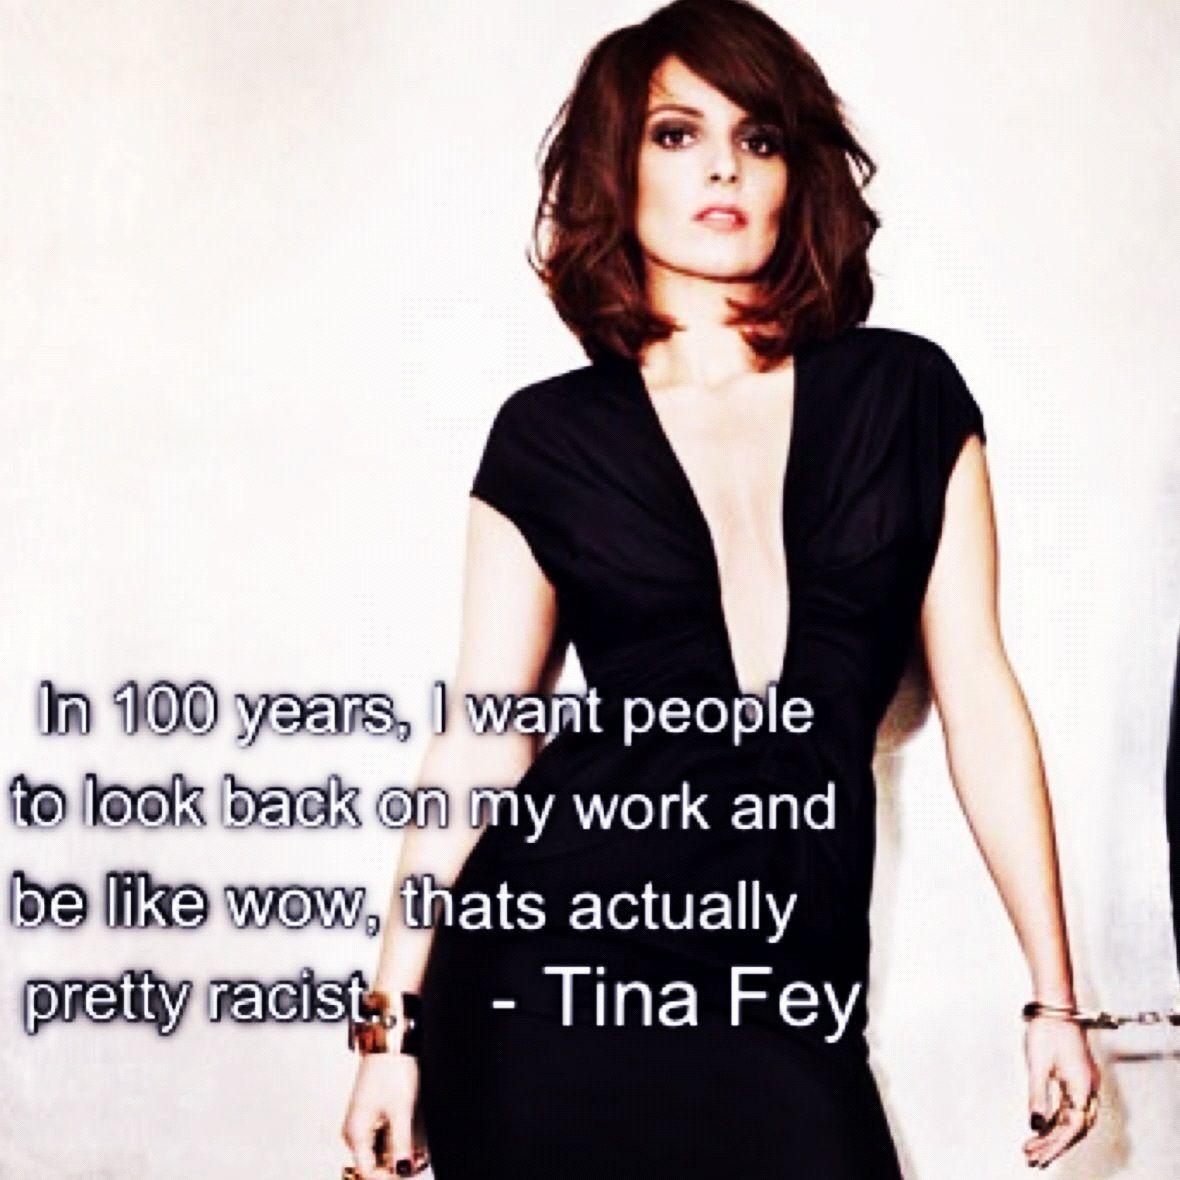 Tina fey quote made my julia timme tina fey quotes pinterest